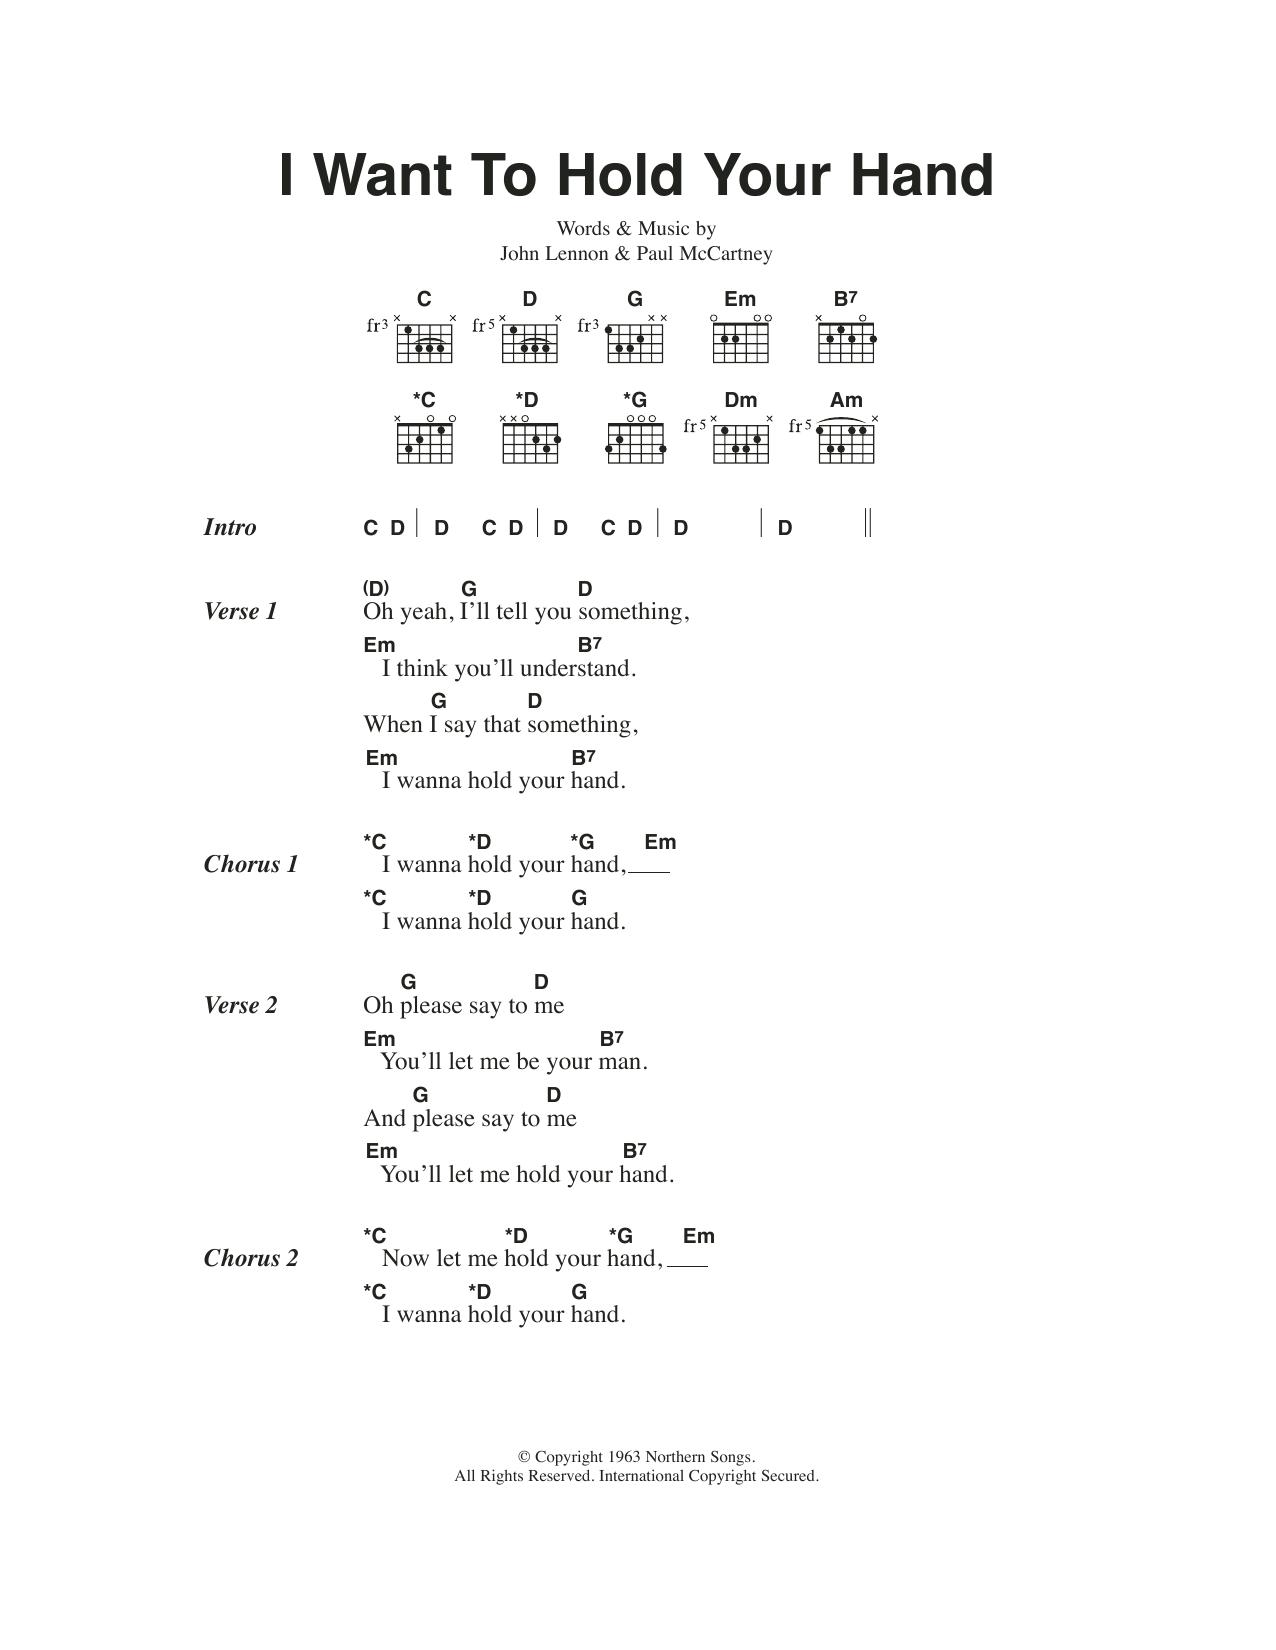 I Wanna Hold Your Hand Chord : wanna, chord, Sheet, Music, Beatles, Guitar, Chords/Lyrics